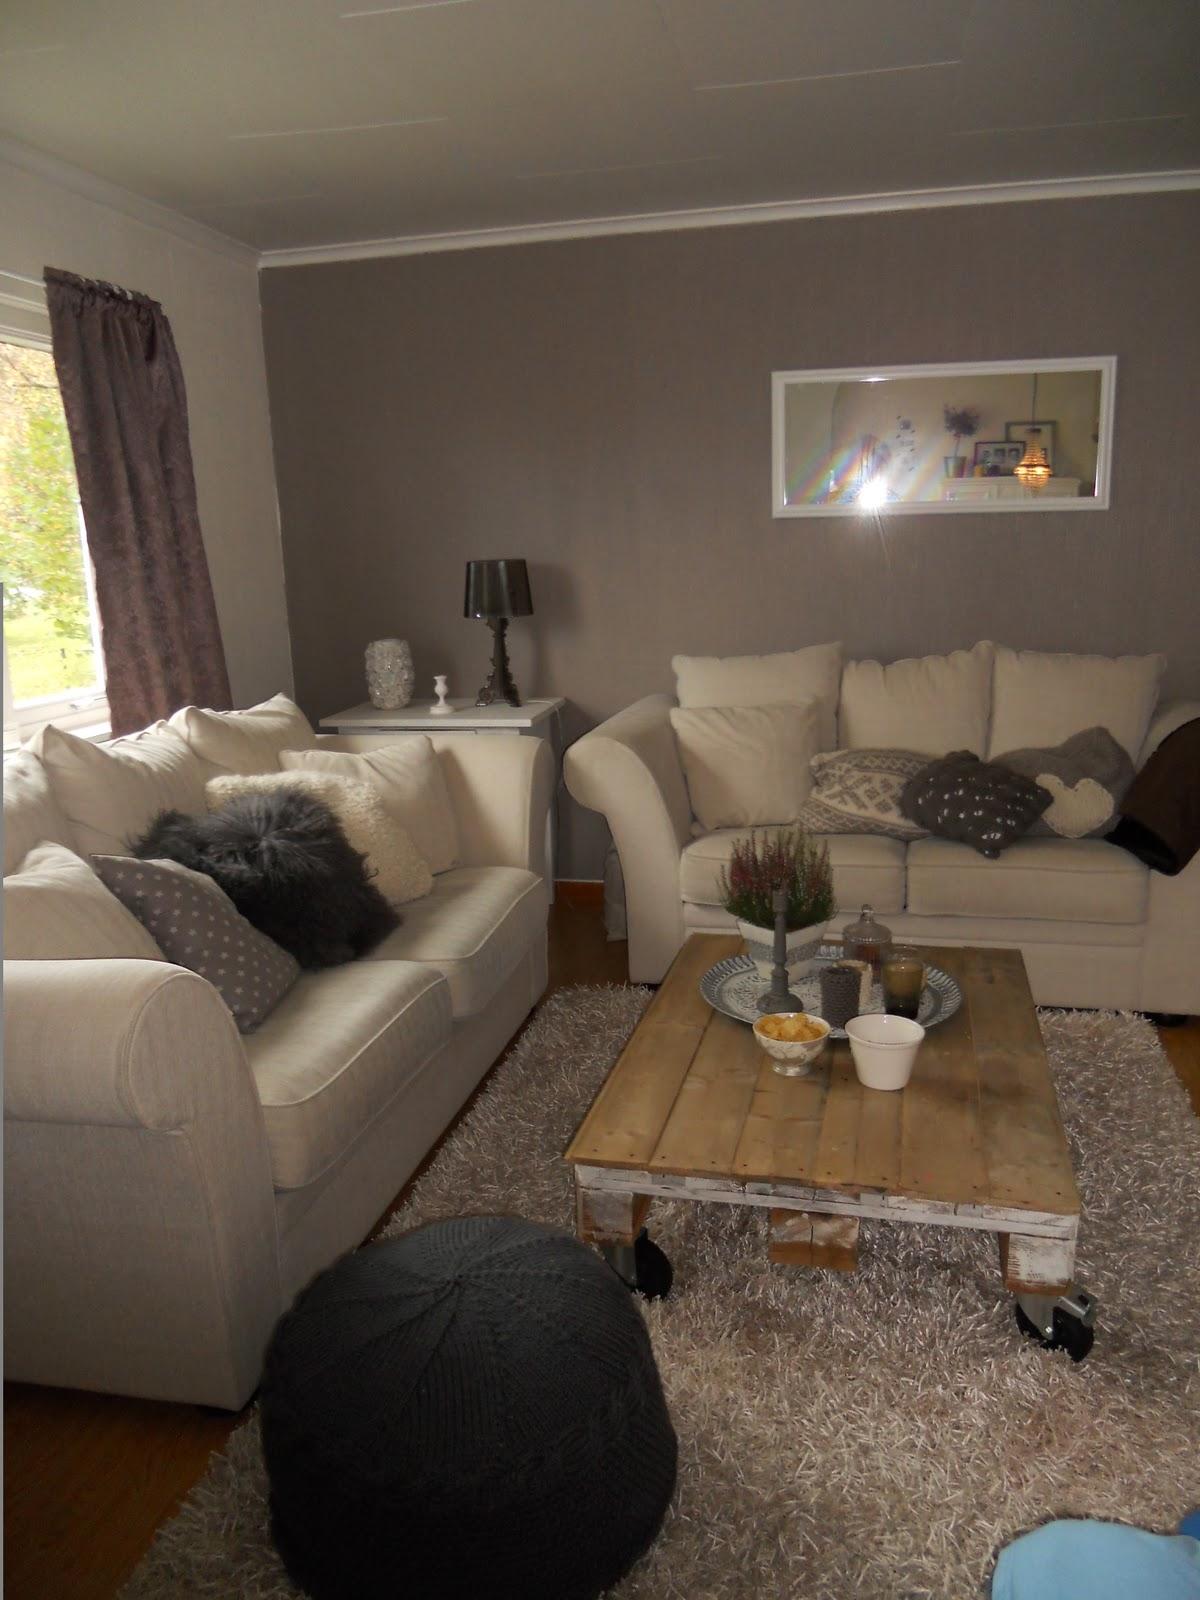 Camillas romantiske hjem : nye gardiner i stue 1, og kaos i stue 2